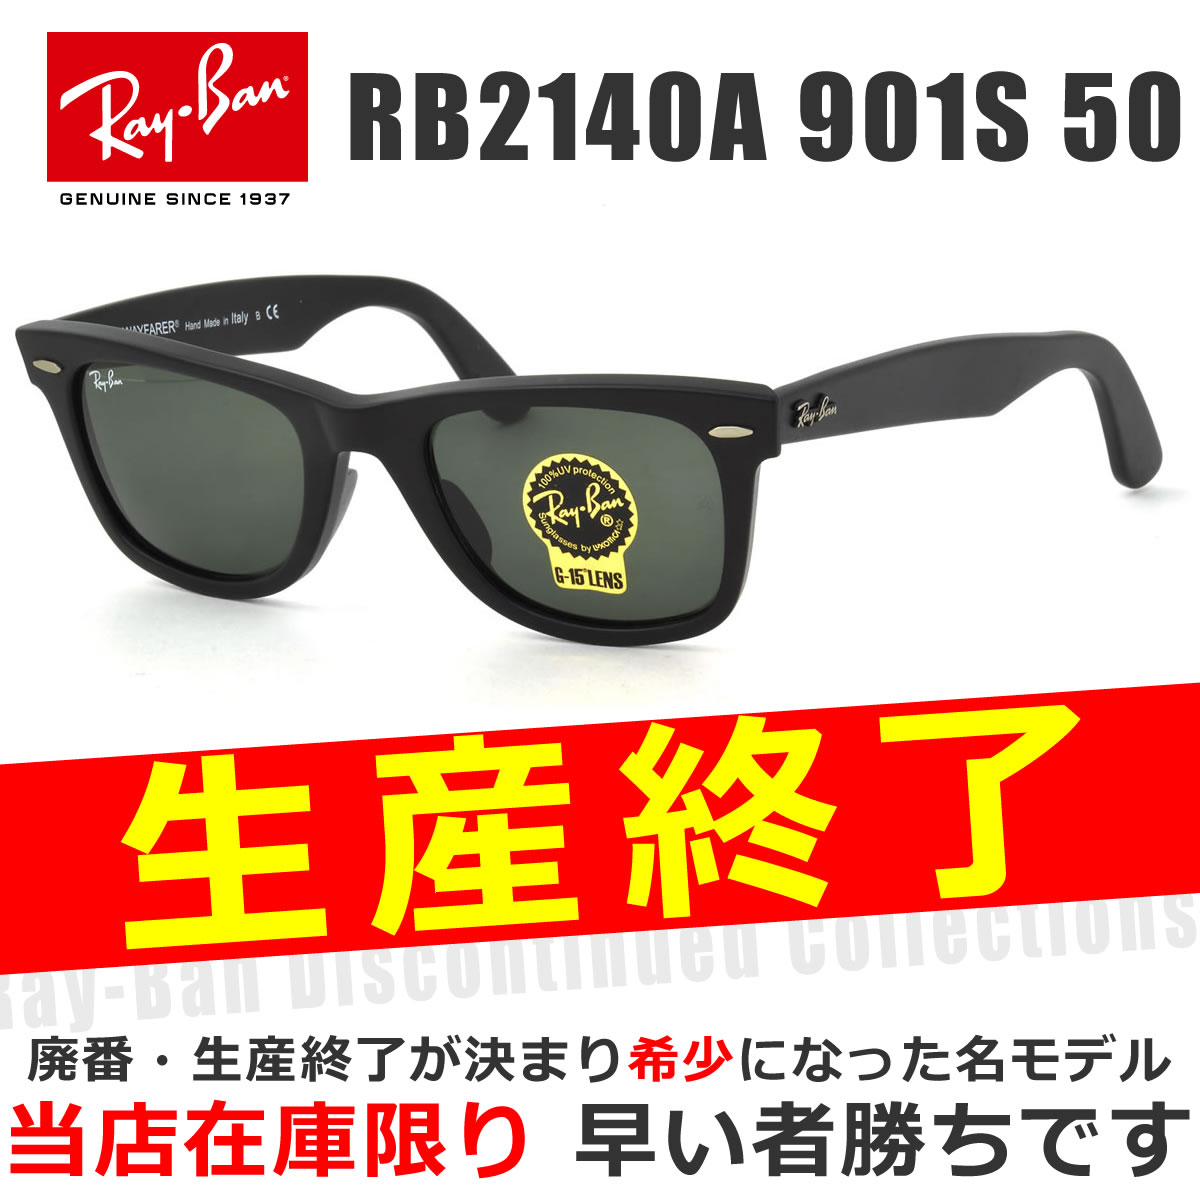 Ray-Ban(雷斑RayBan)太阳眼镜RB2140A 901S